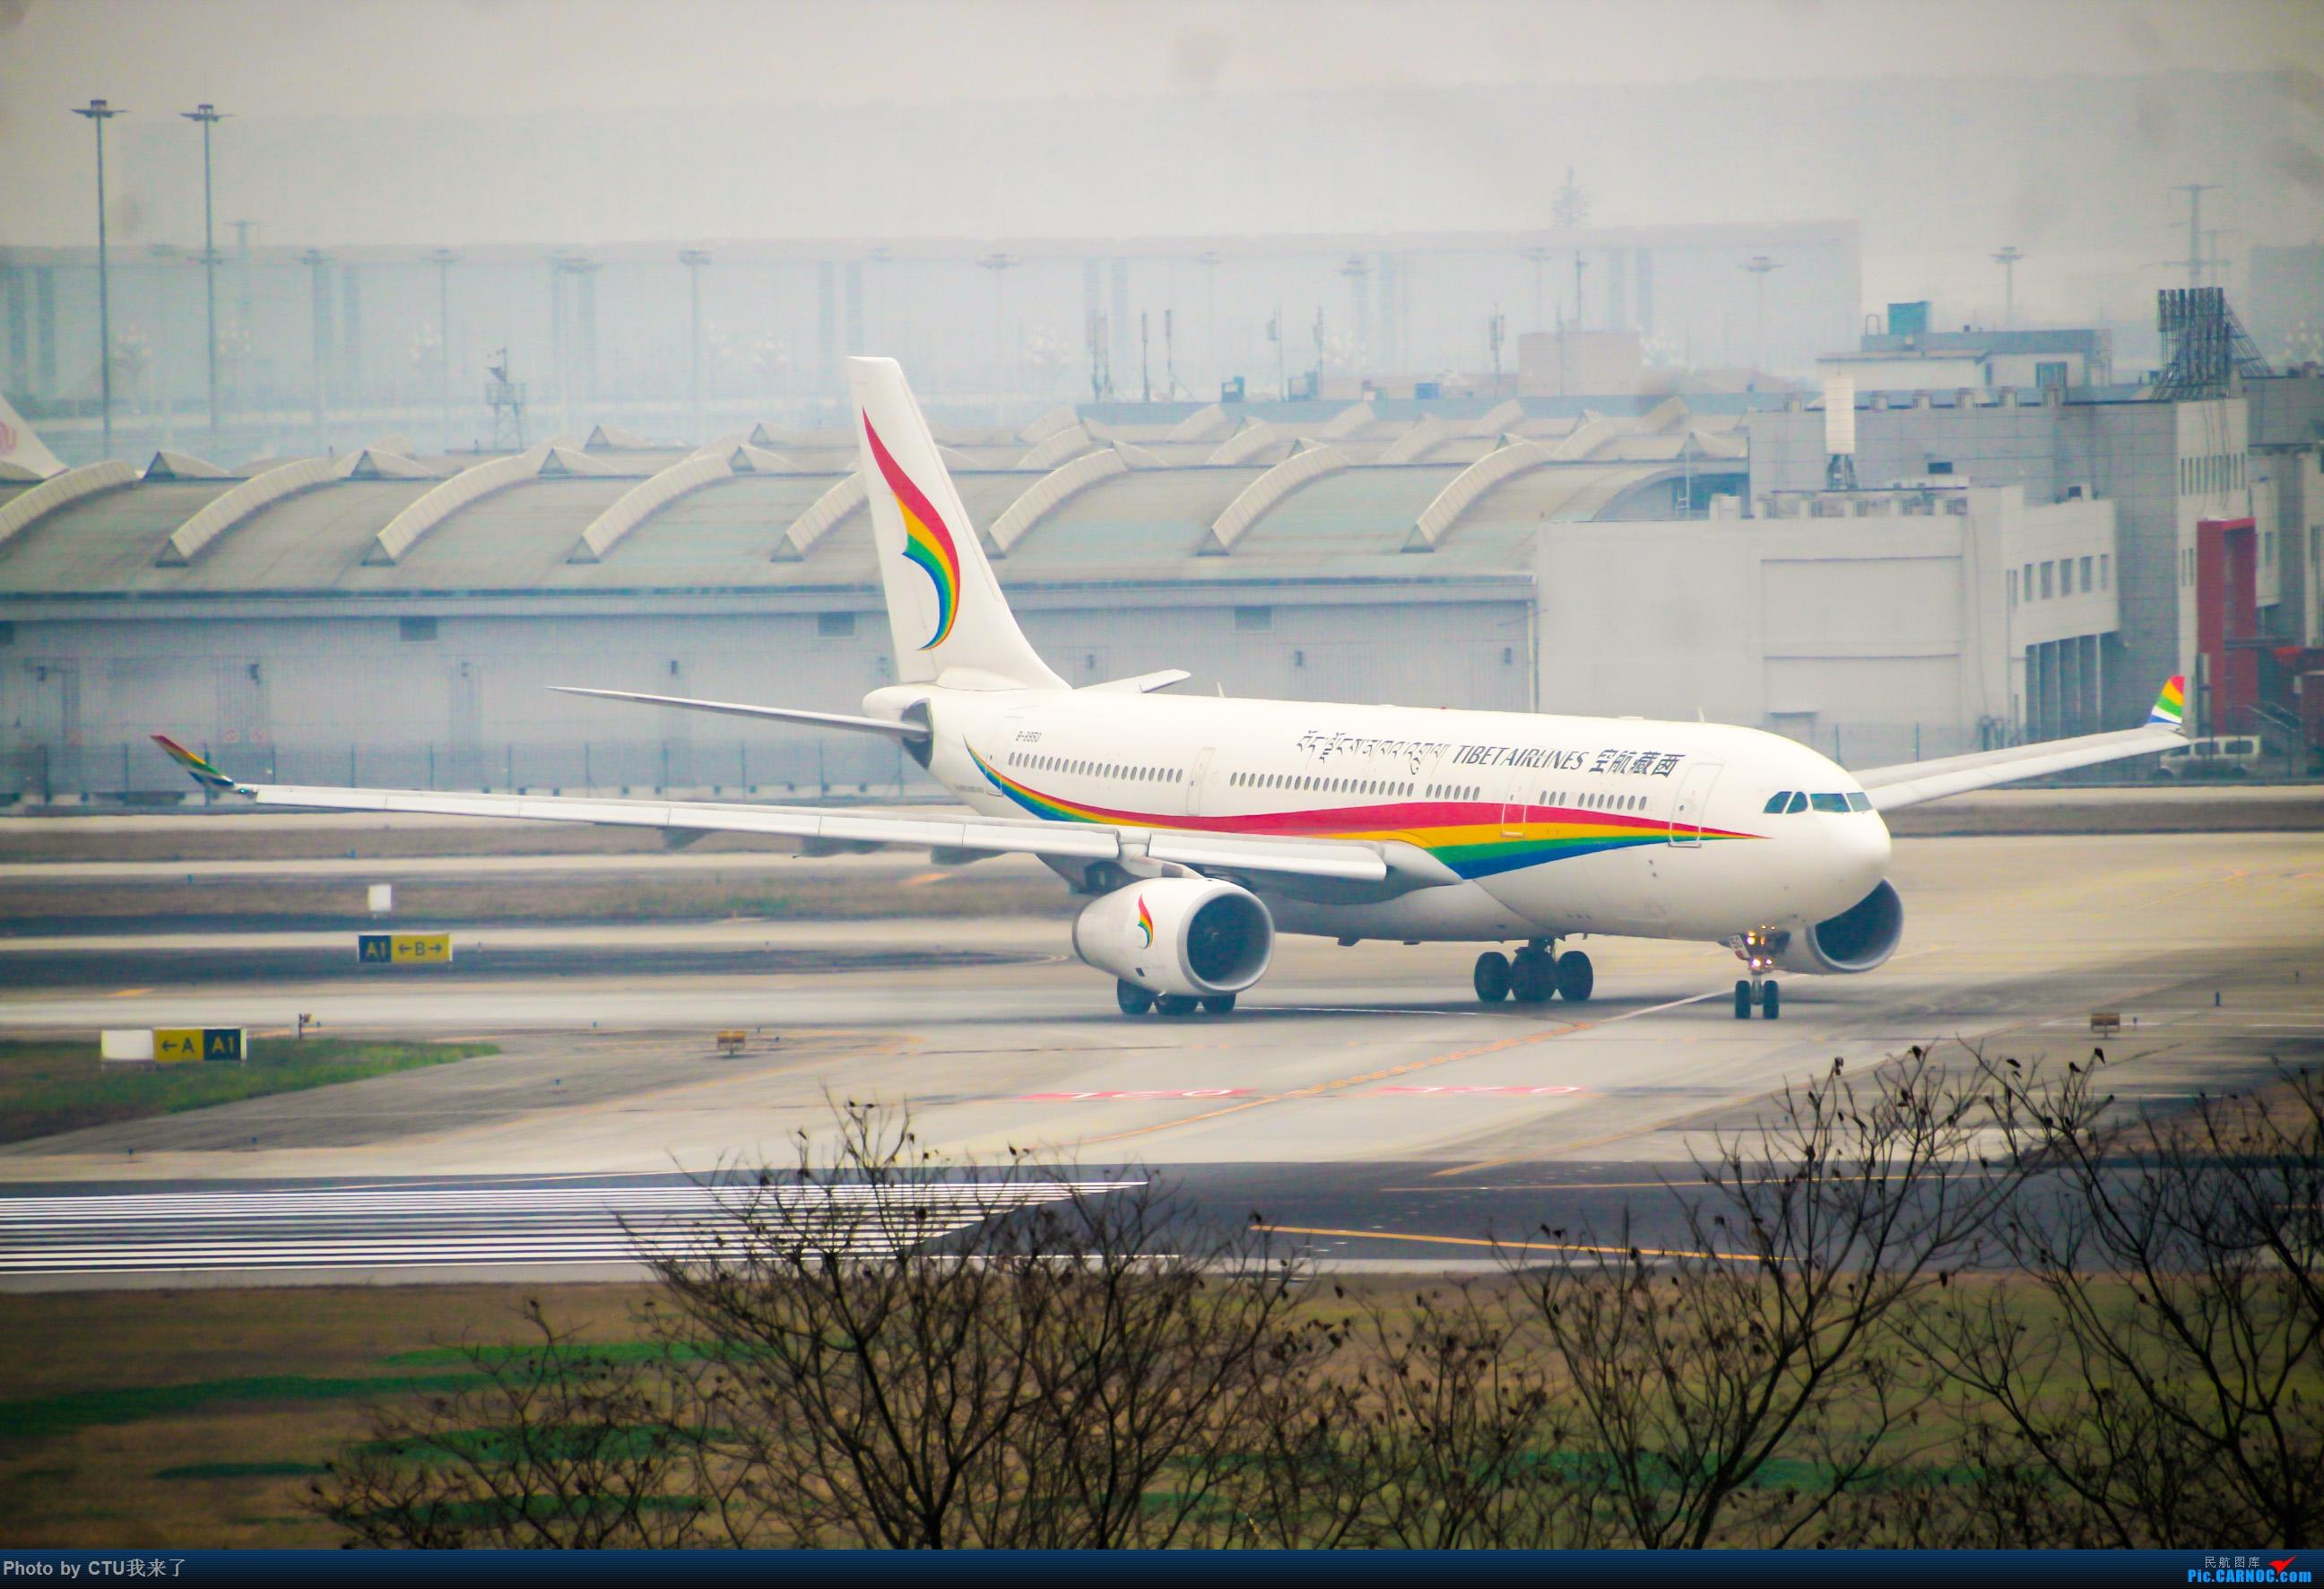 Re:[原创]CTU水泥天拍机,验证烂天好货的铁律 AIRBUS A330-200 B-8950 中国成都双流国际机场